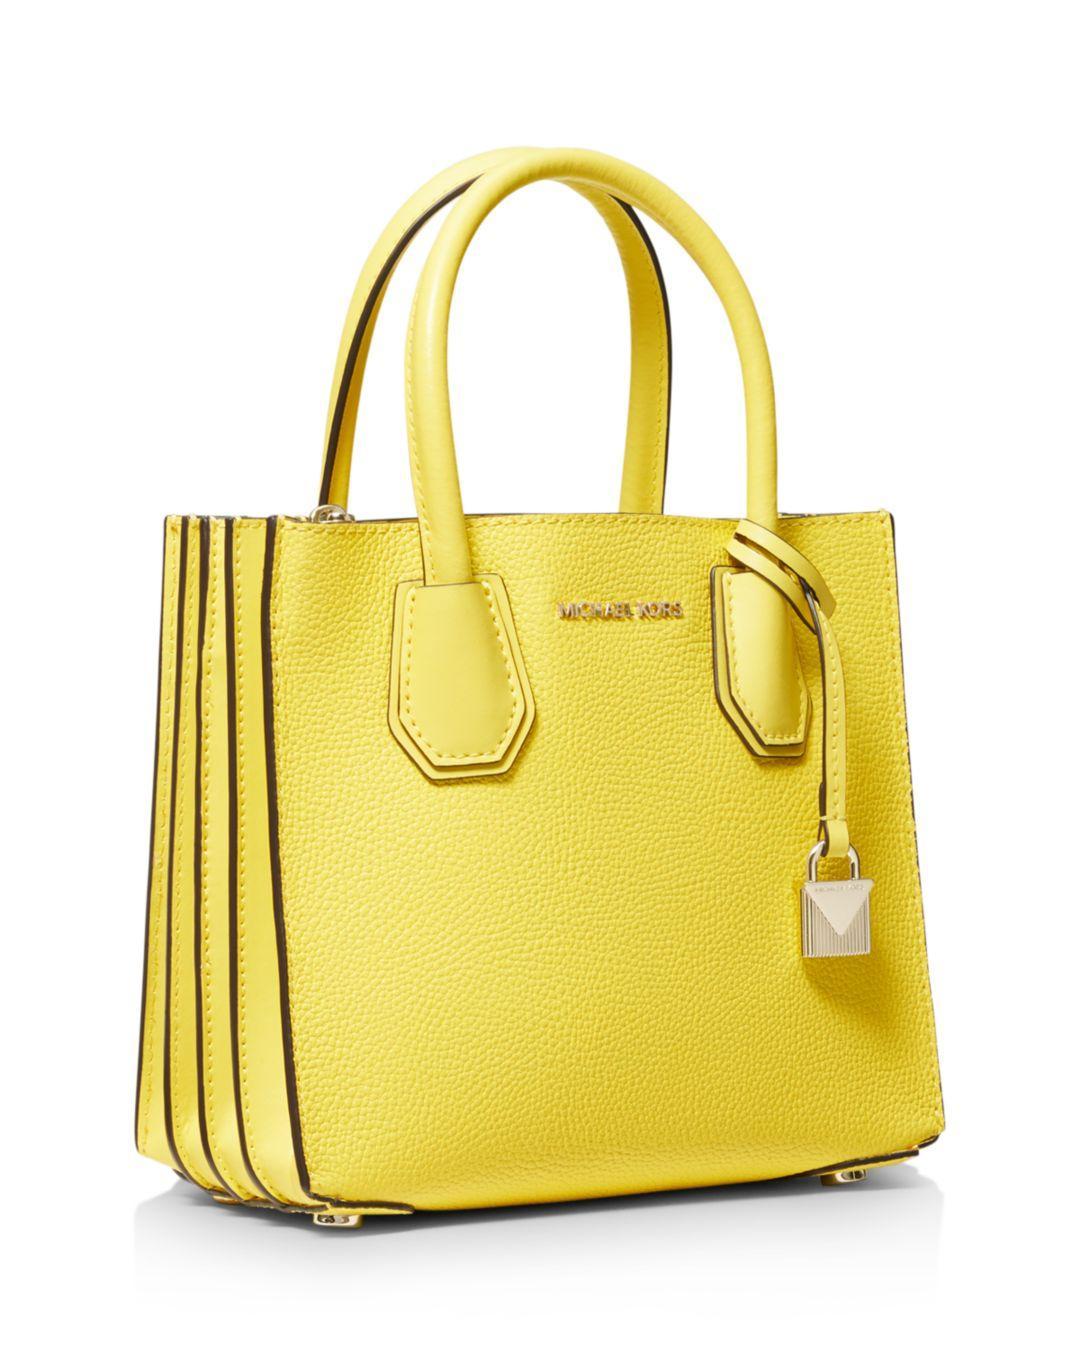 edf8f445b4 MICHAEL Michael Kors Medium Mercer Leather Accordion Messenger Bag in Yellow  - Lyst